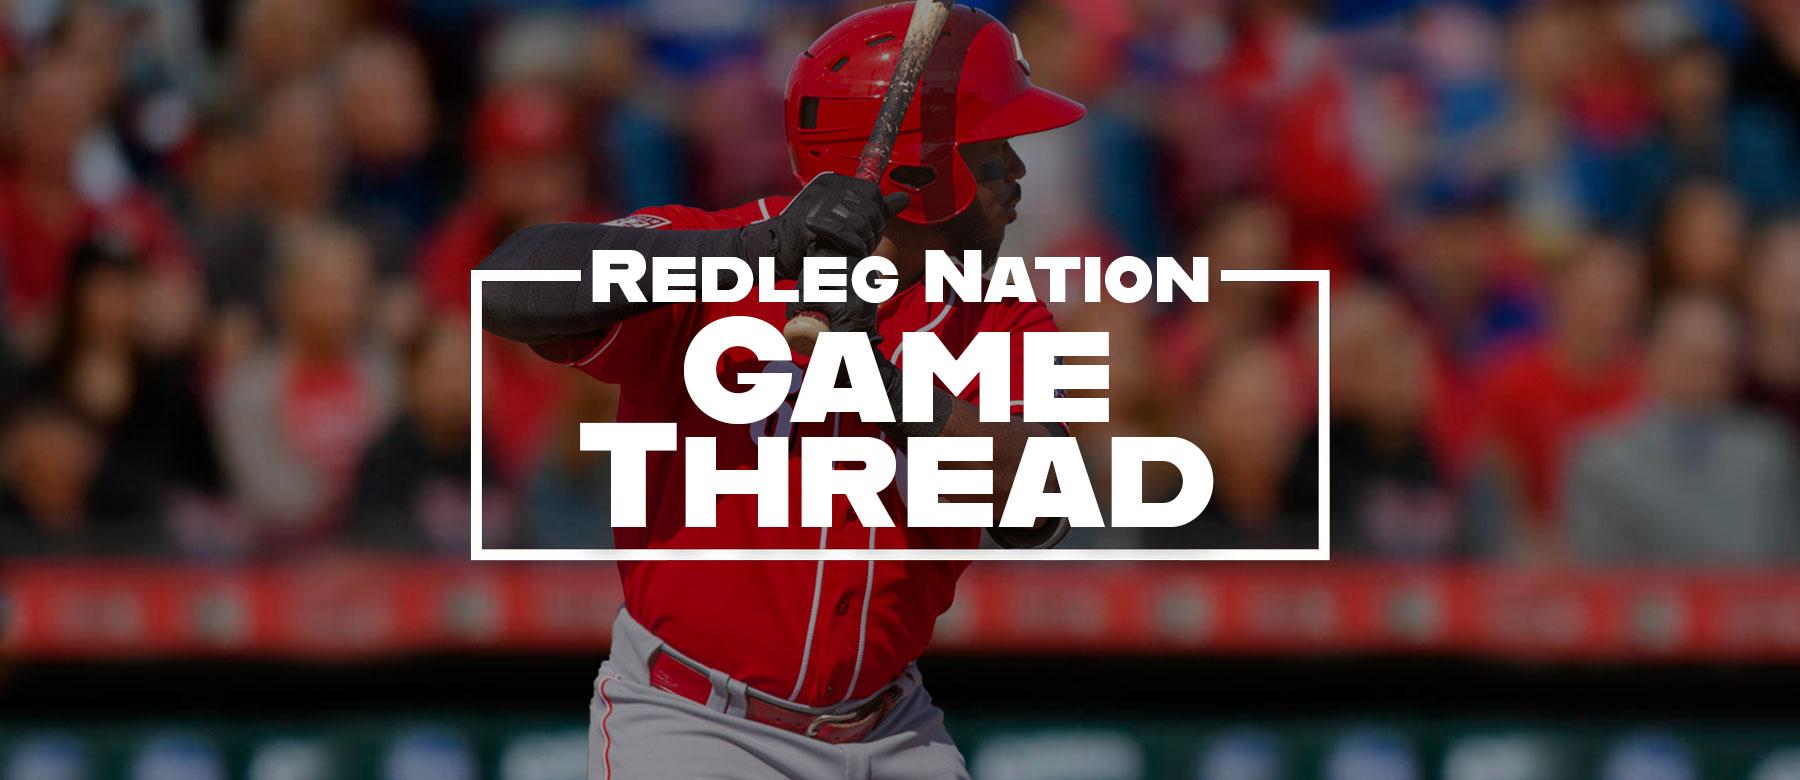 Cincinnati Reds vs Seattle Mariners - September 12, 2019 - Redleg Nation